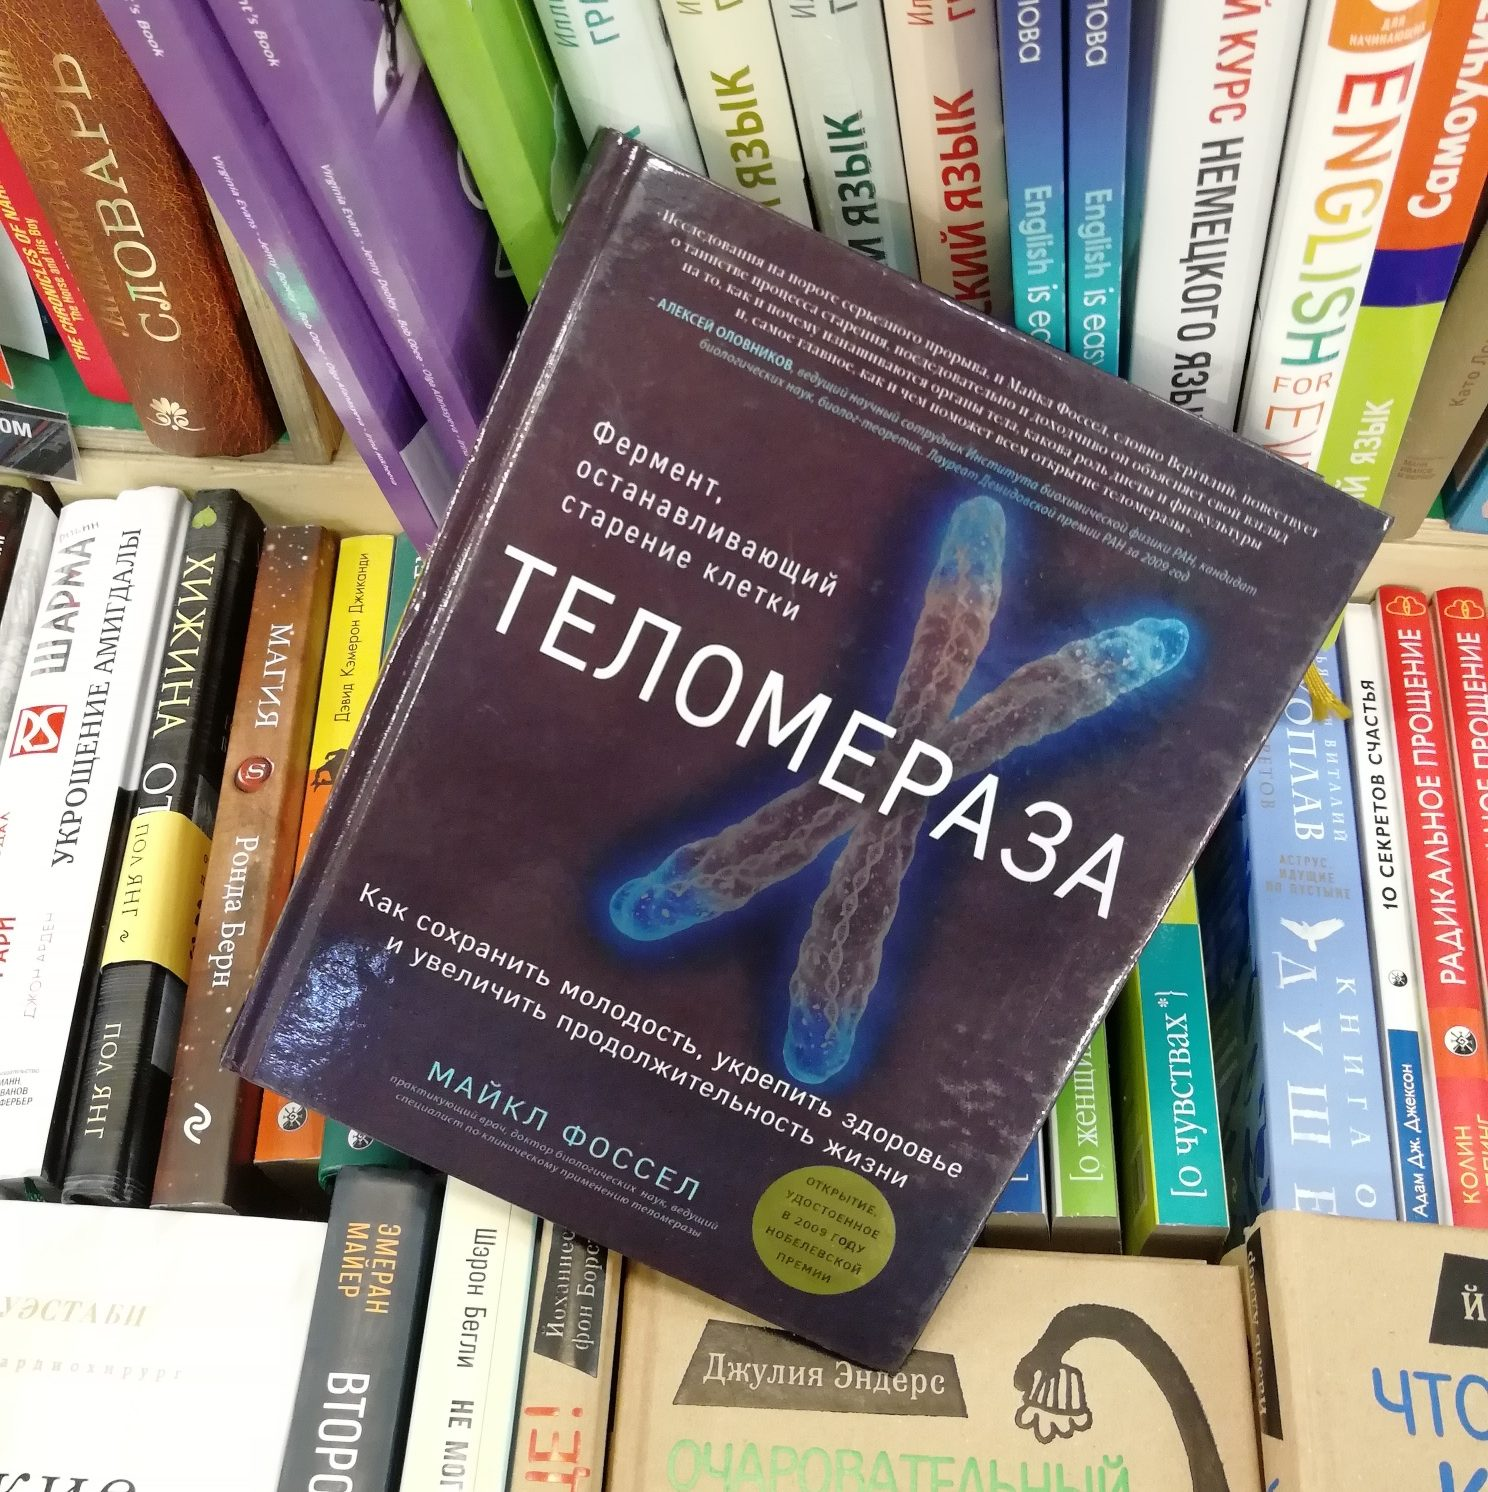 Теломераза, отзыв о книге Майкла Фоссела